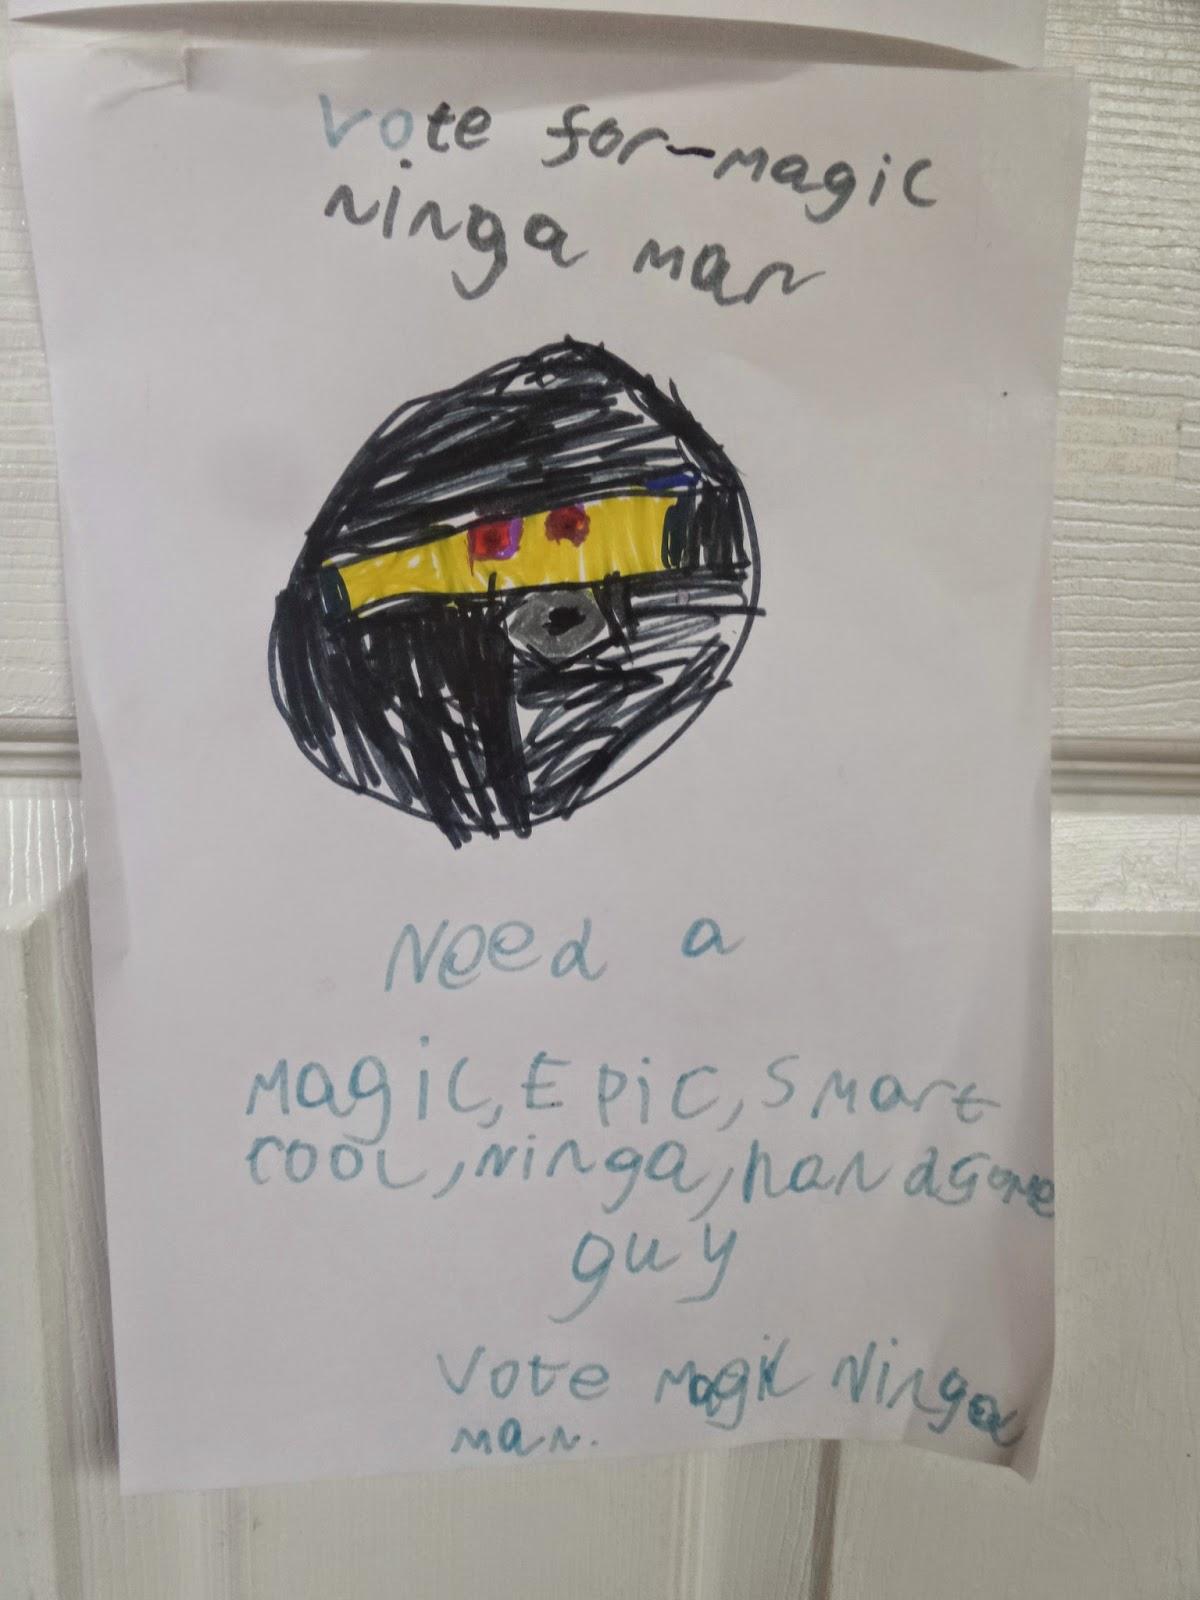 Vote For Magic Ninja Man